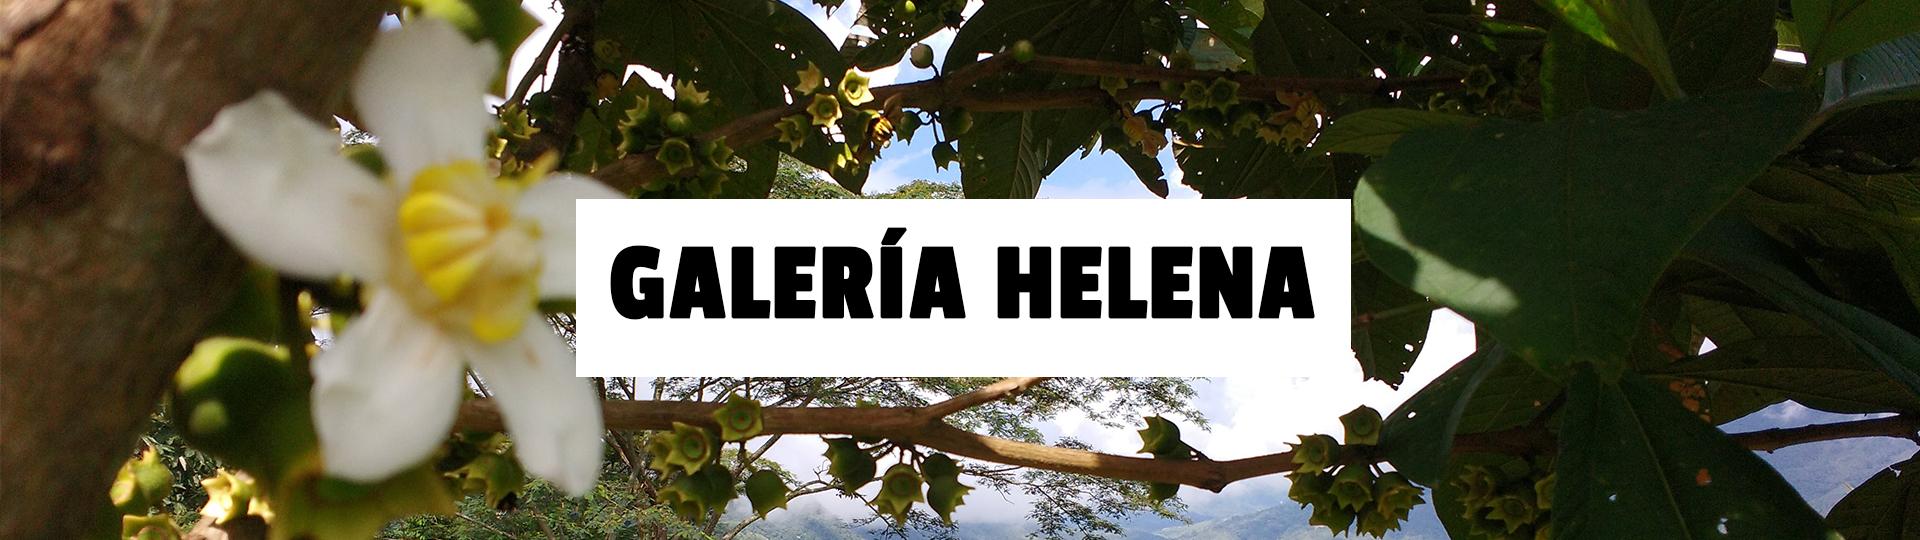 galeria-Helena-1